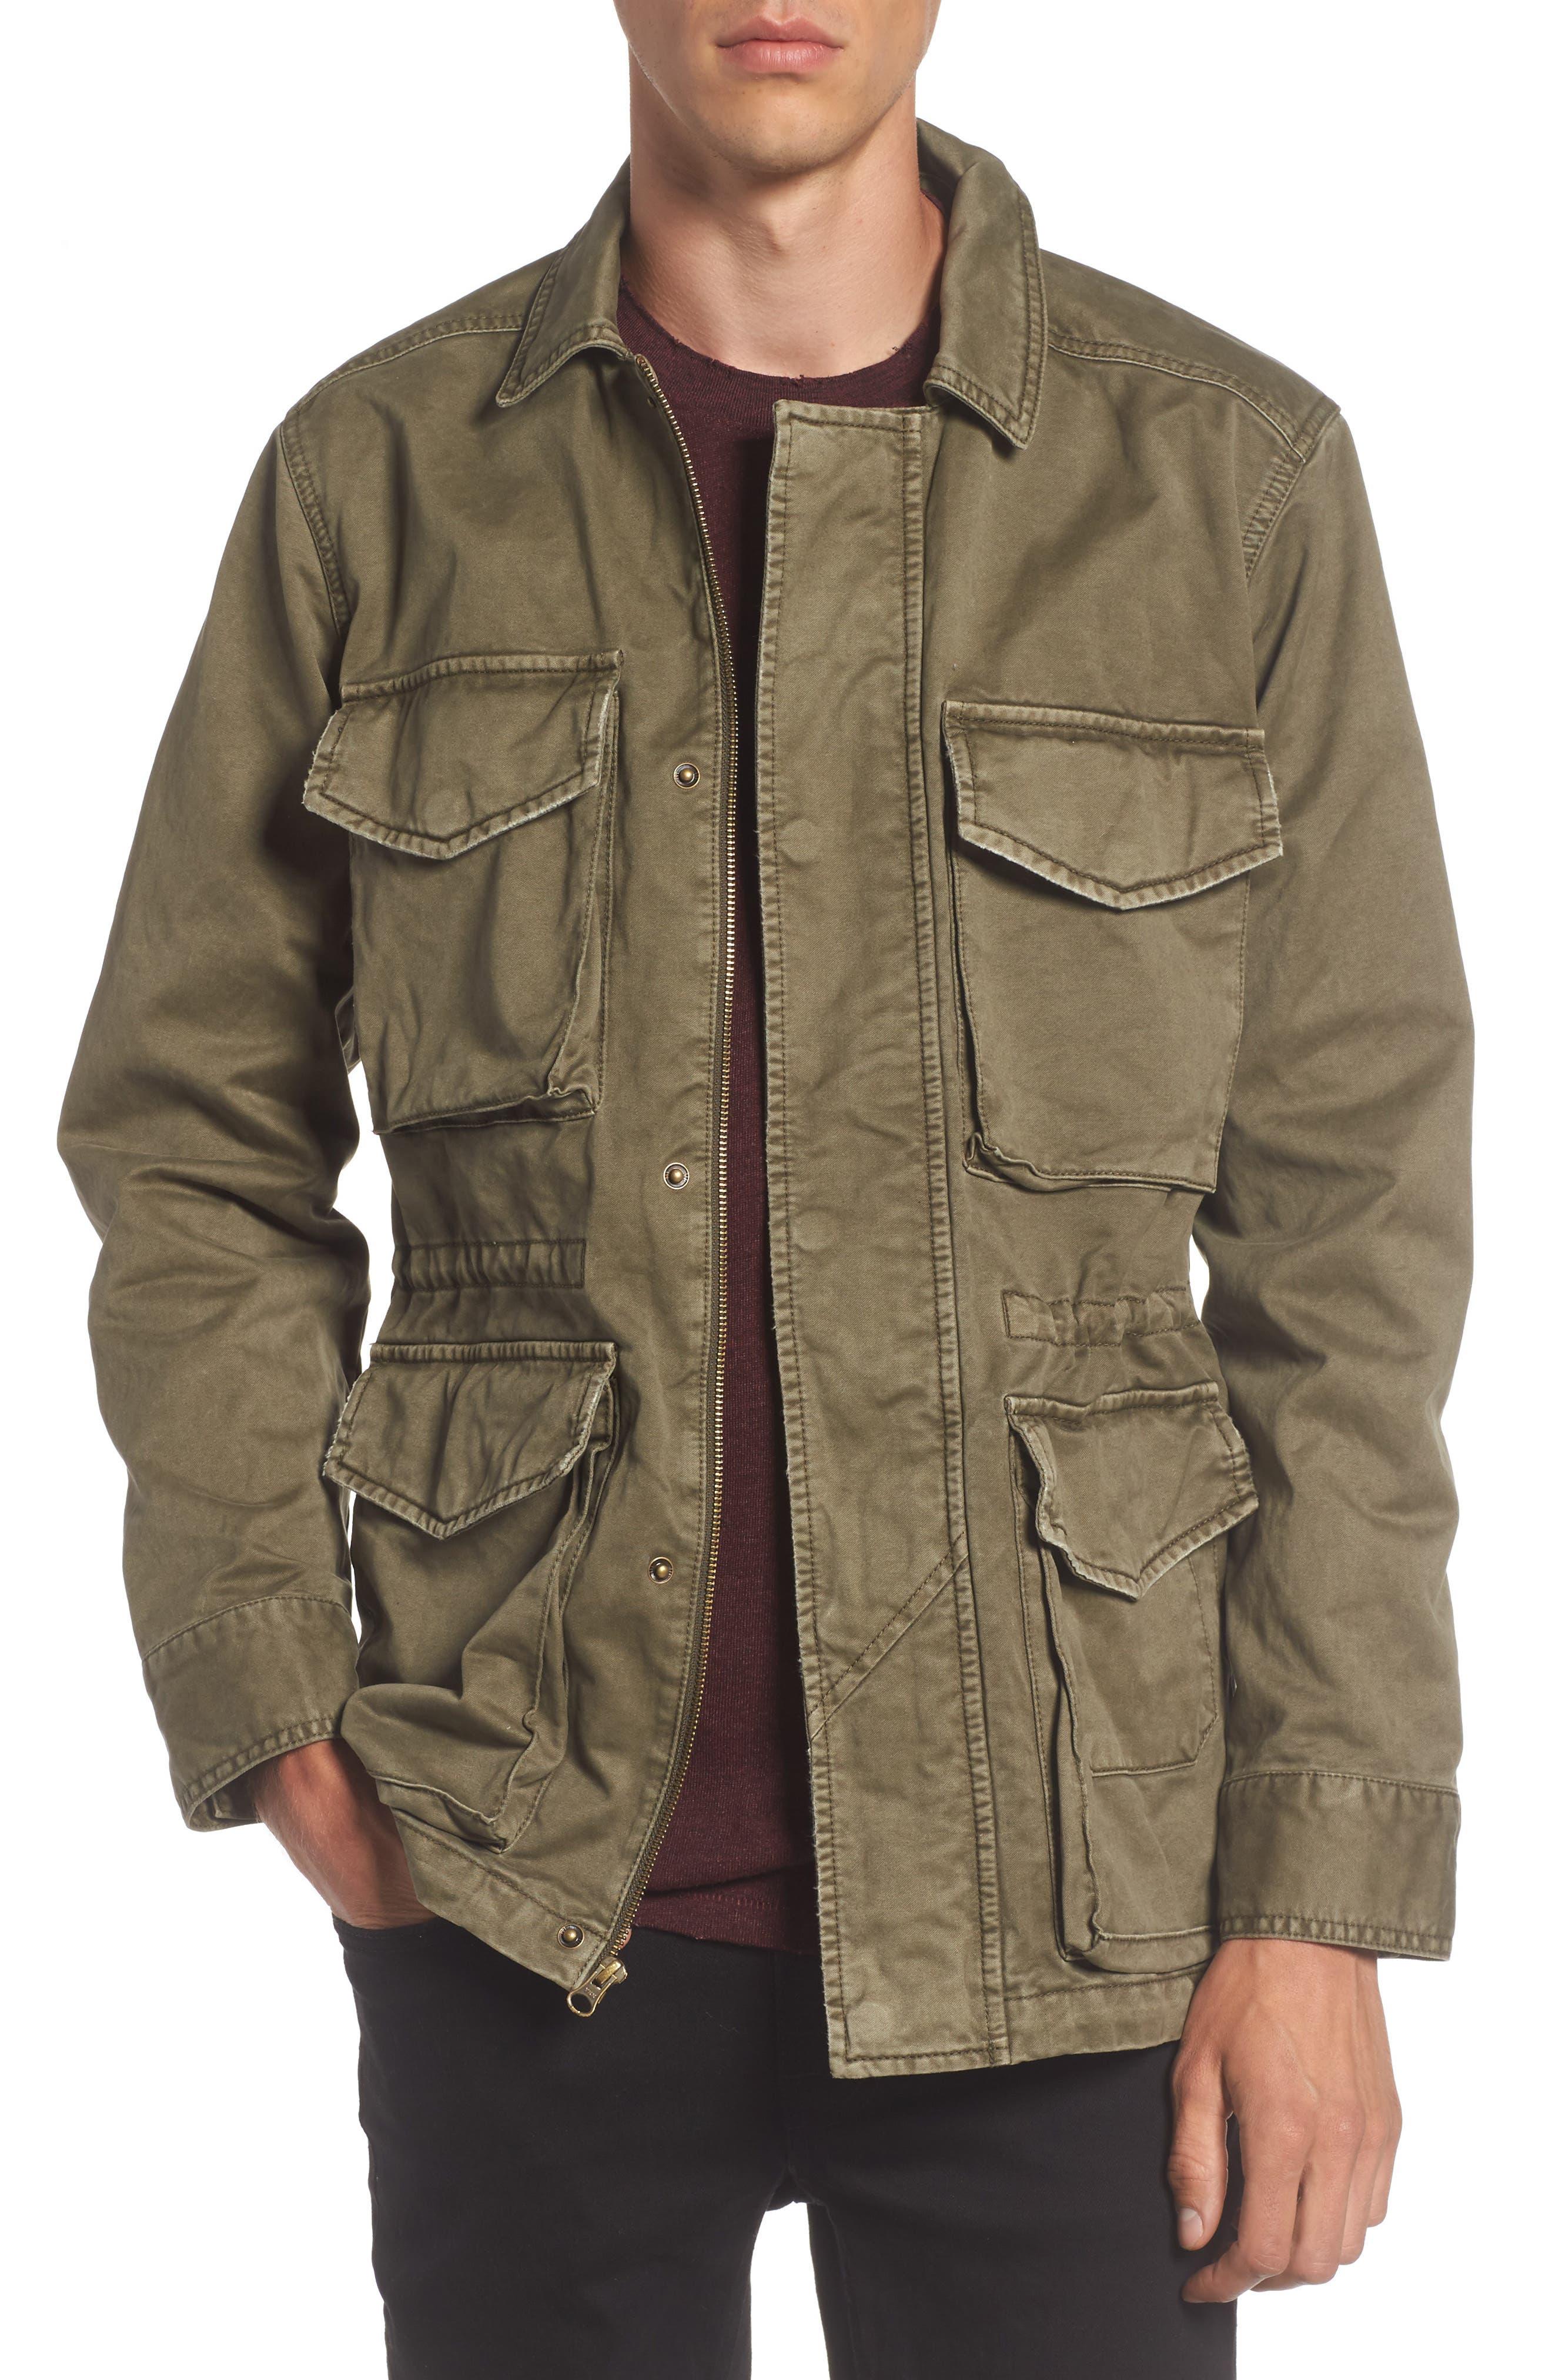 Treasure & Bond Waxed Cotton Field Jacket